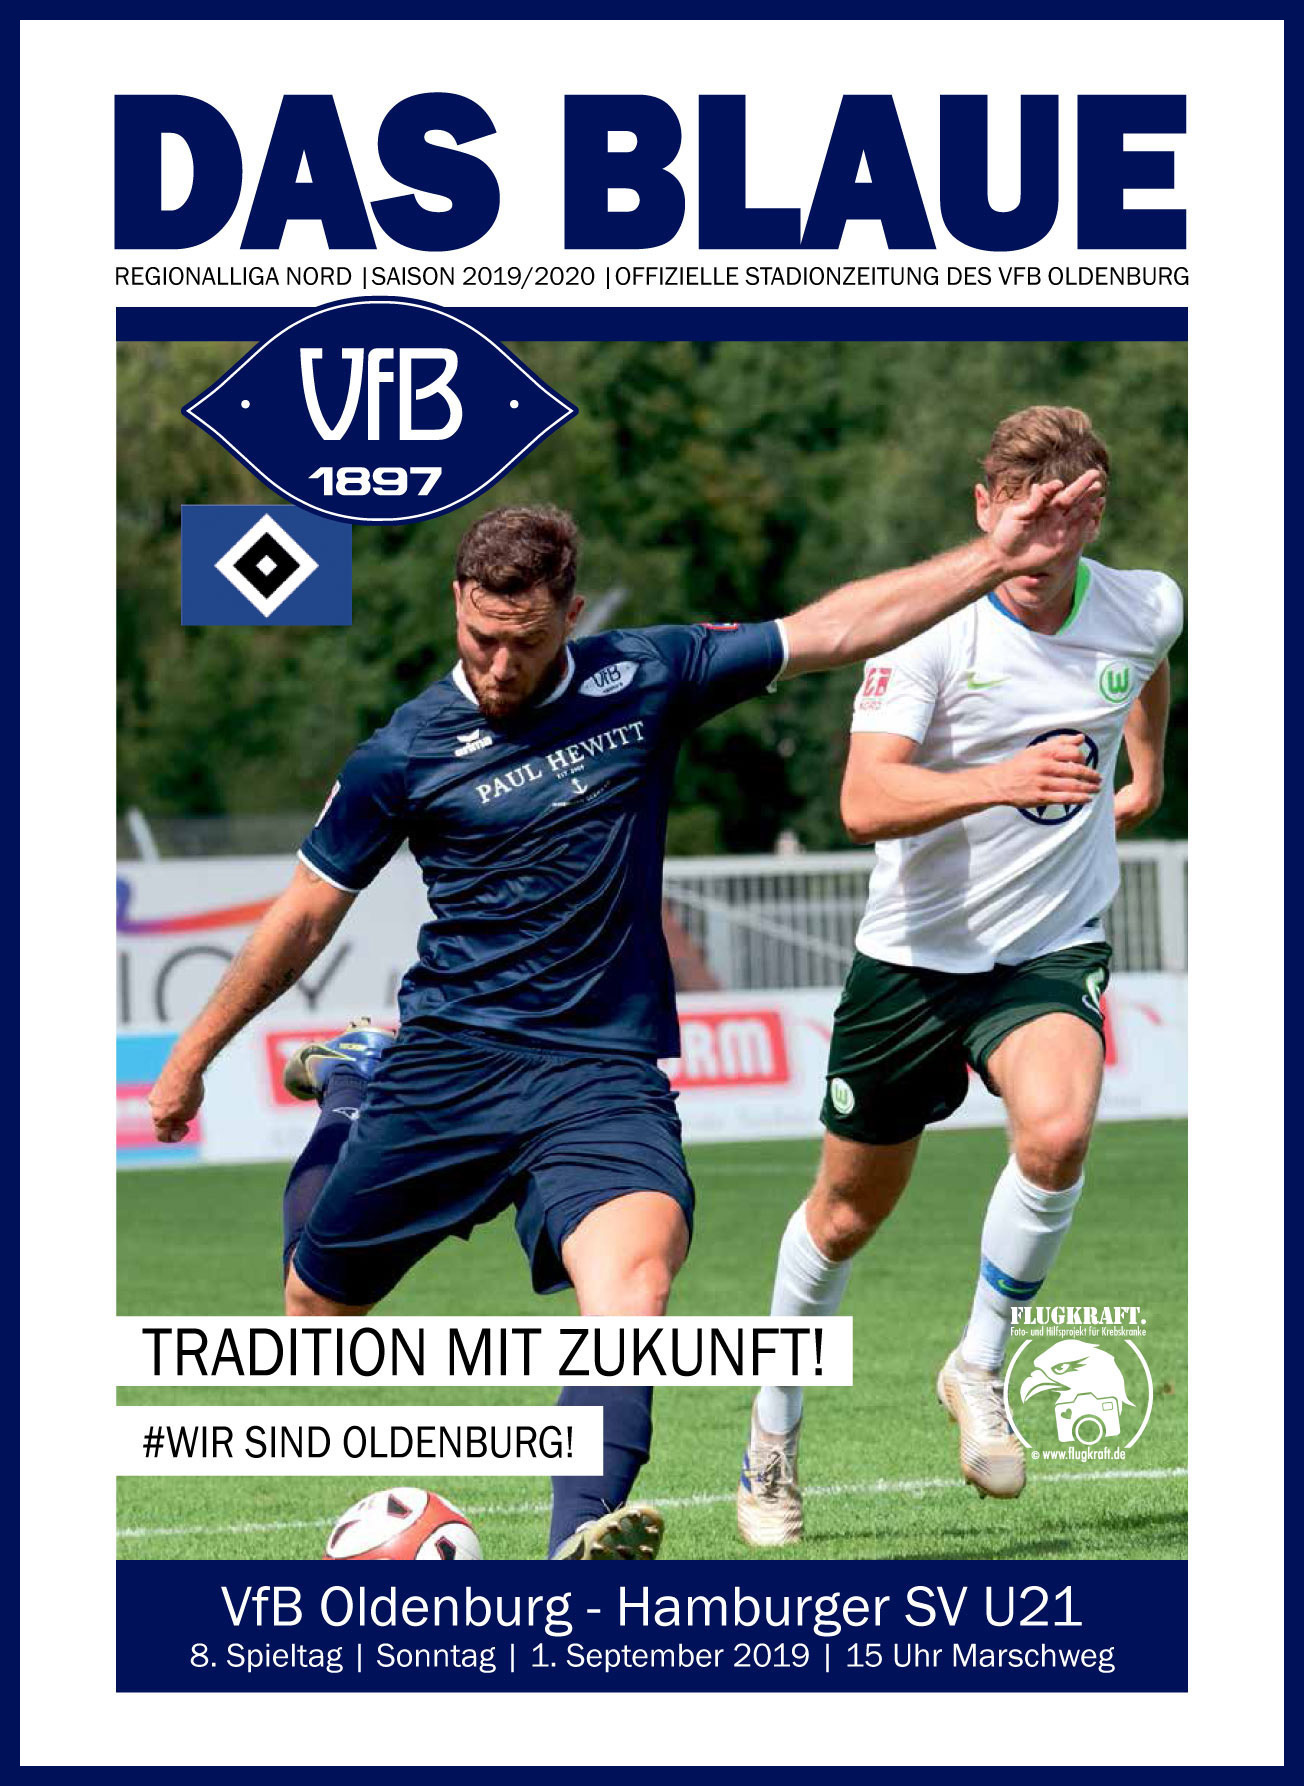 https://vfb-oldenburg.de/wp-content/uploads/VFB_Oldenburg_8_Spieltag_2019_2020-1-3.jpg